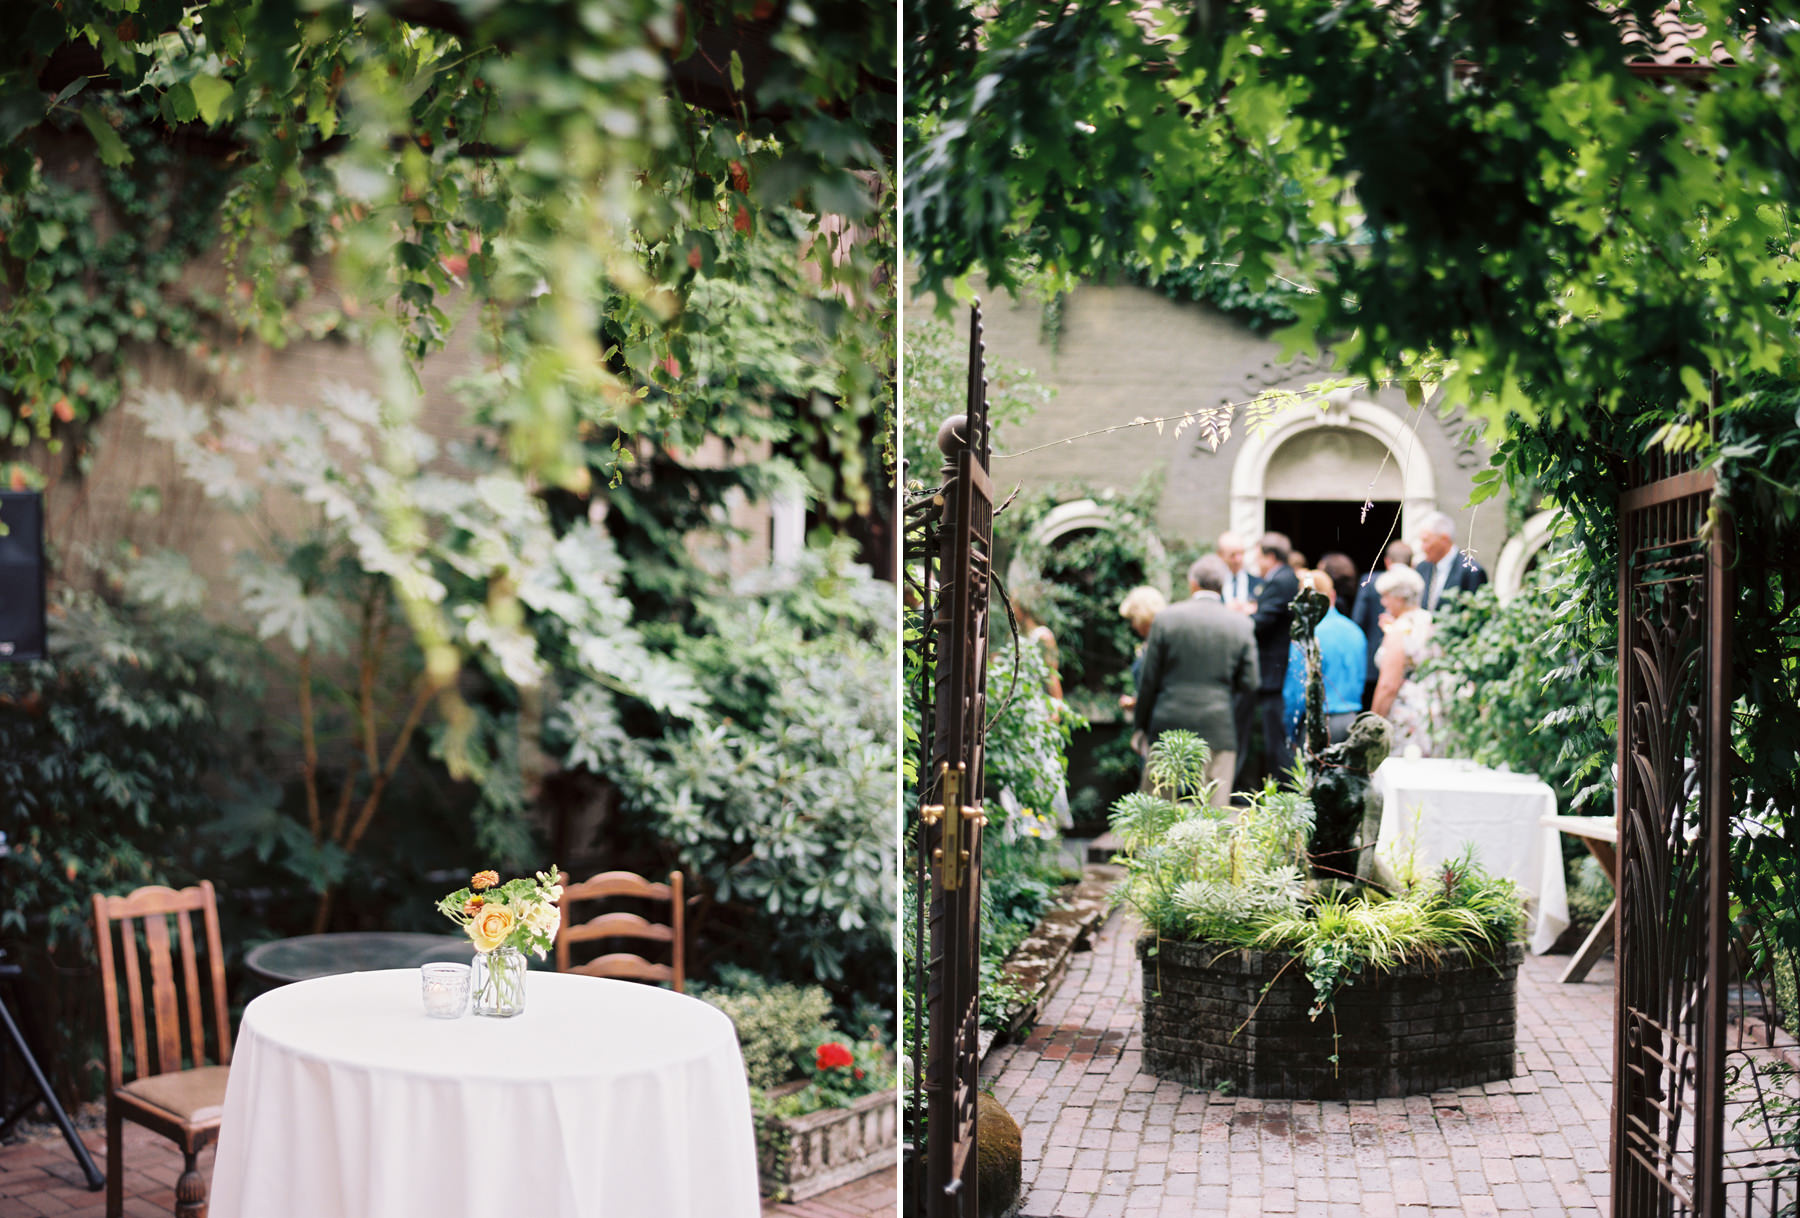 192-kodak-portra-400-film-wedding-photos-at-the-corson-building.jpg